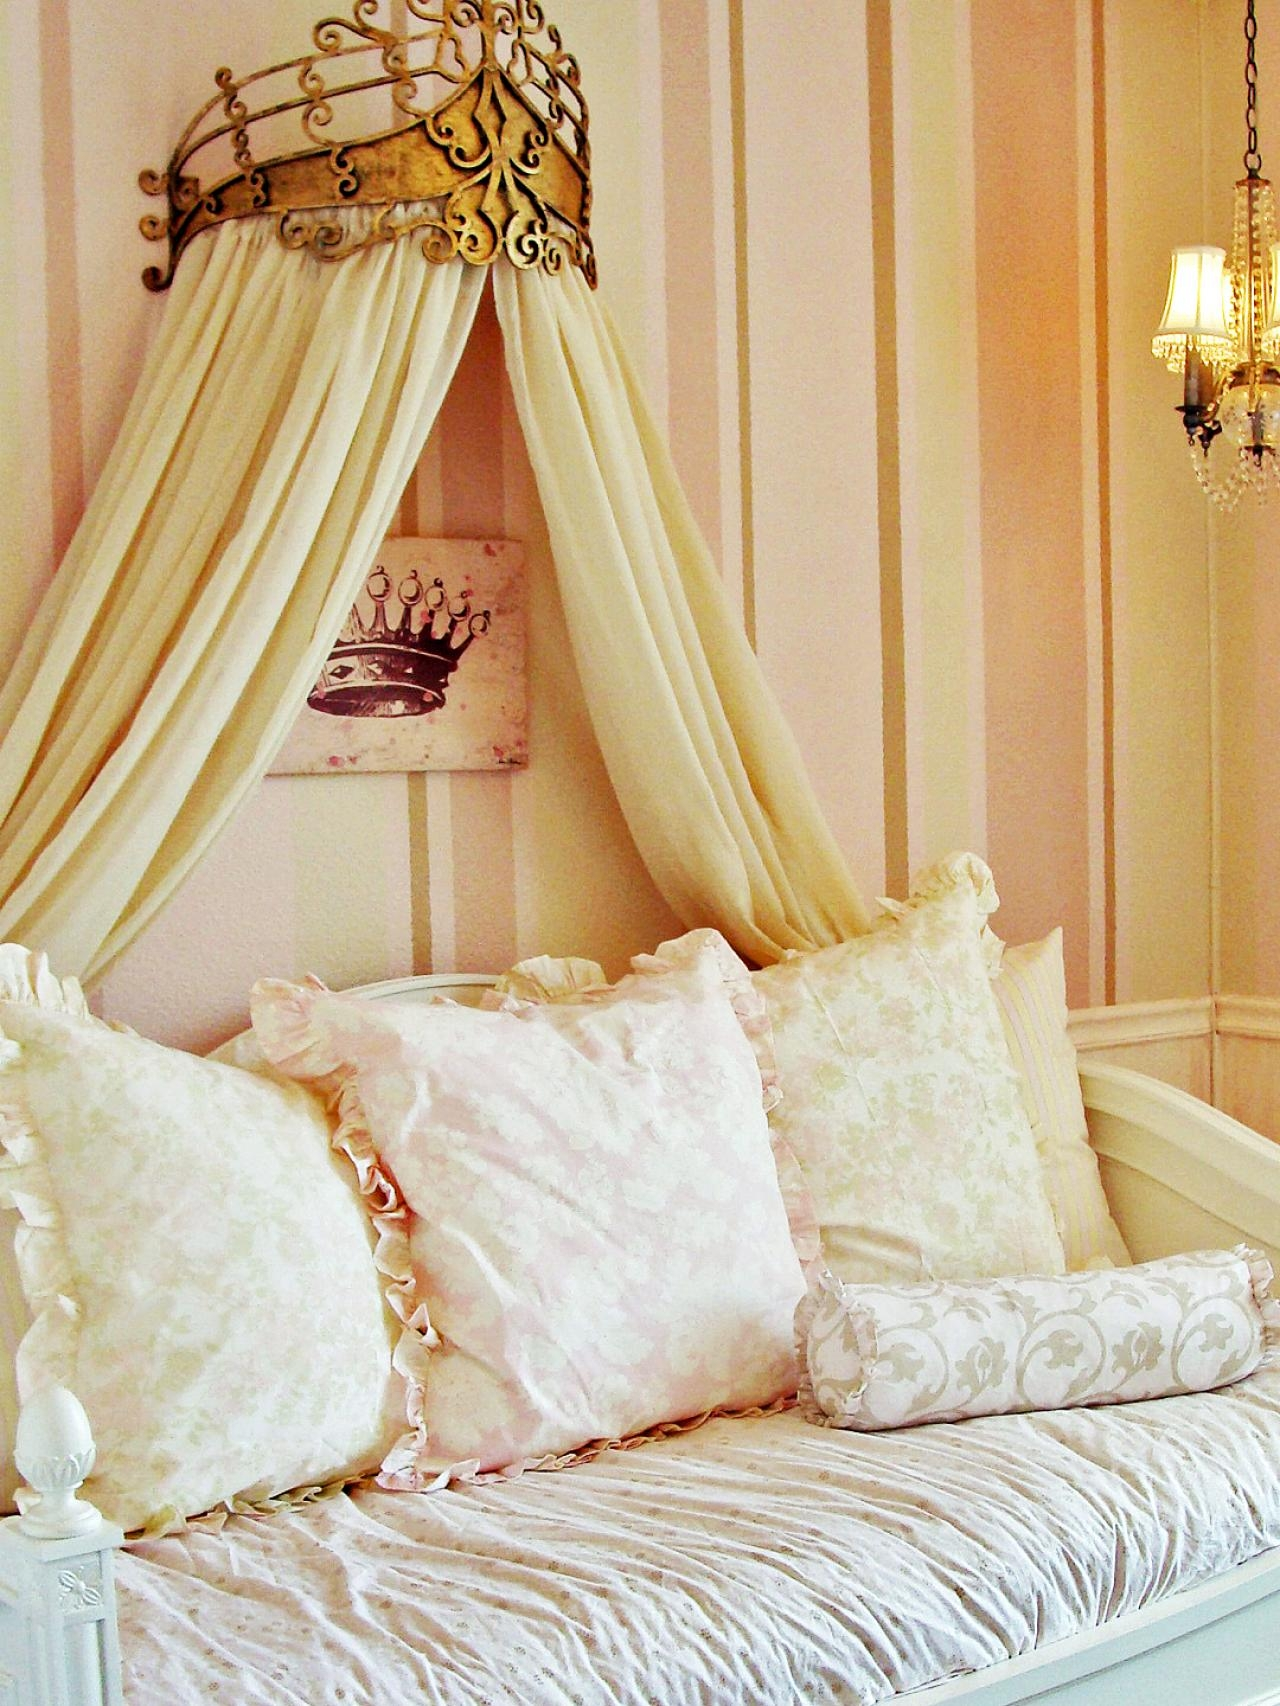 Little girl daybed bedding & Daybed Bedding For Girls - Foter